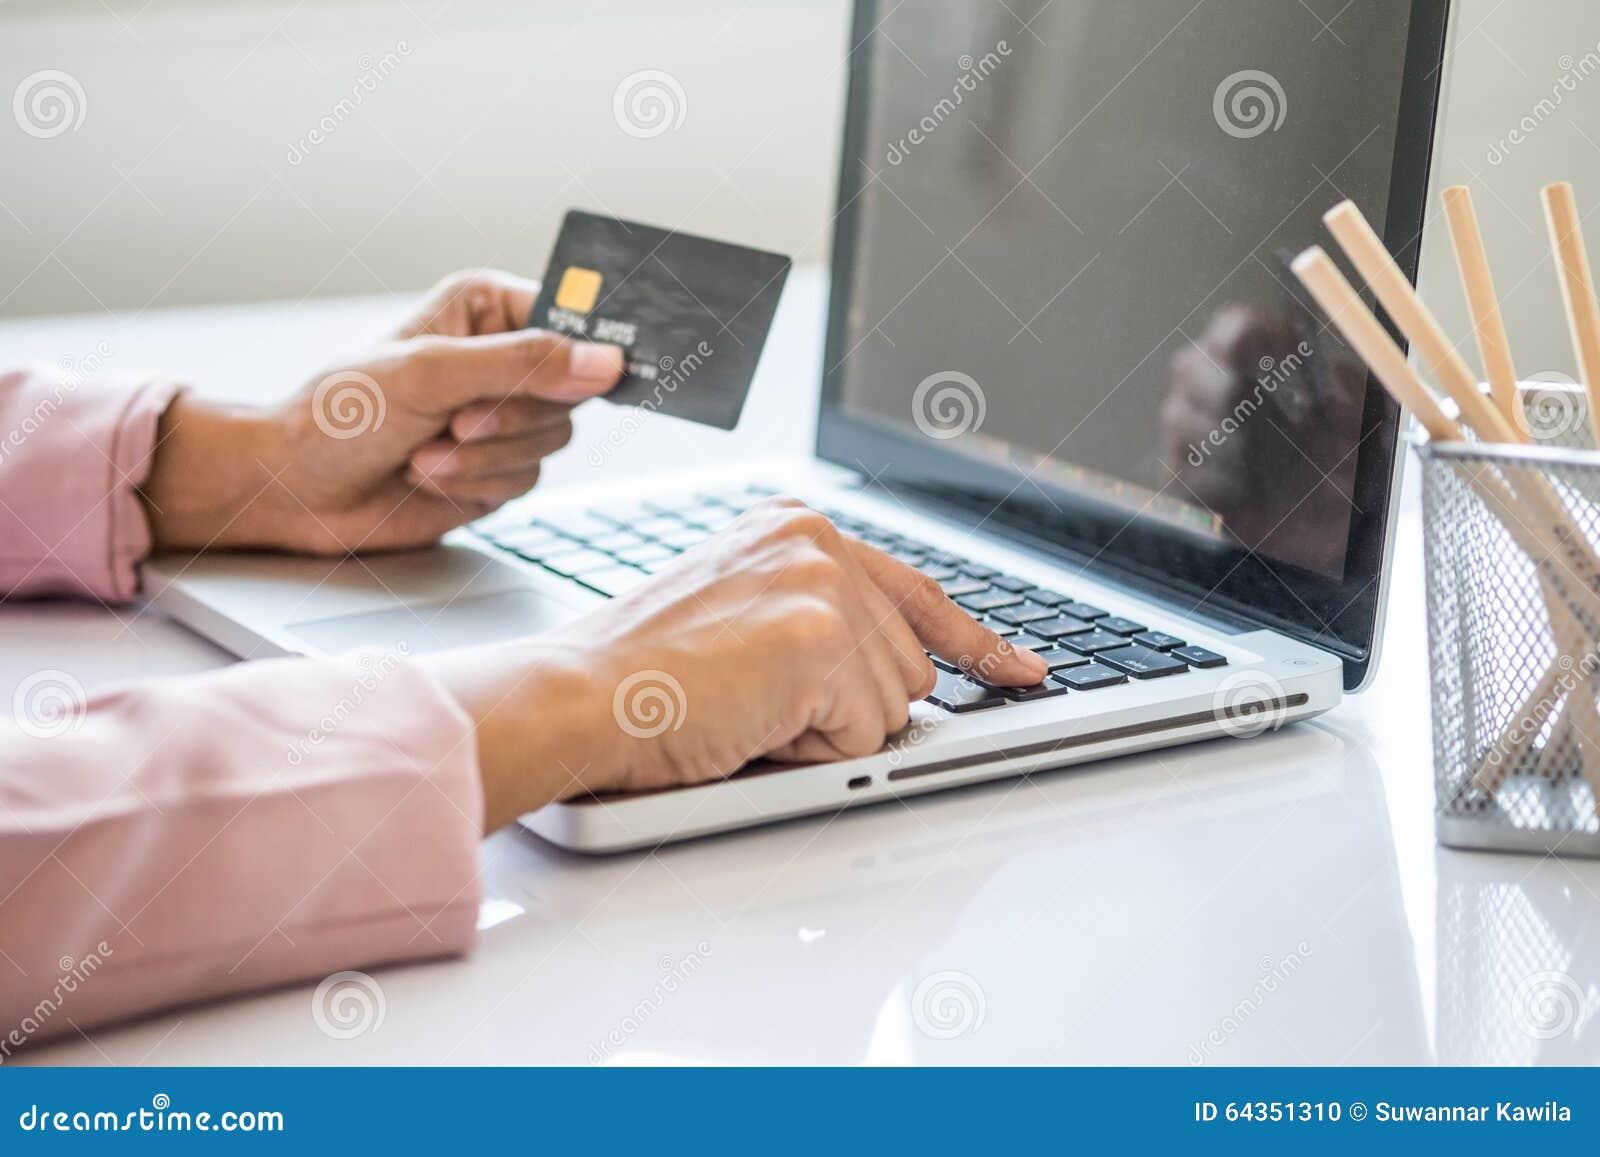 Speaking, Asian retail online